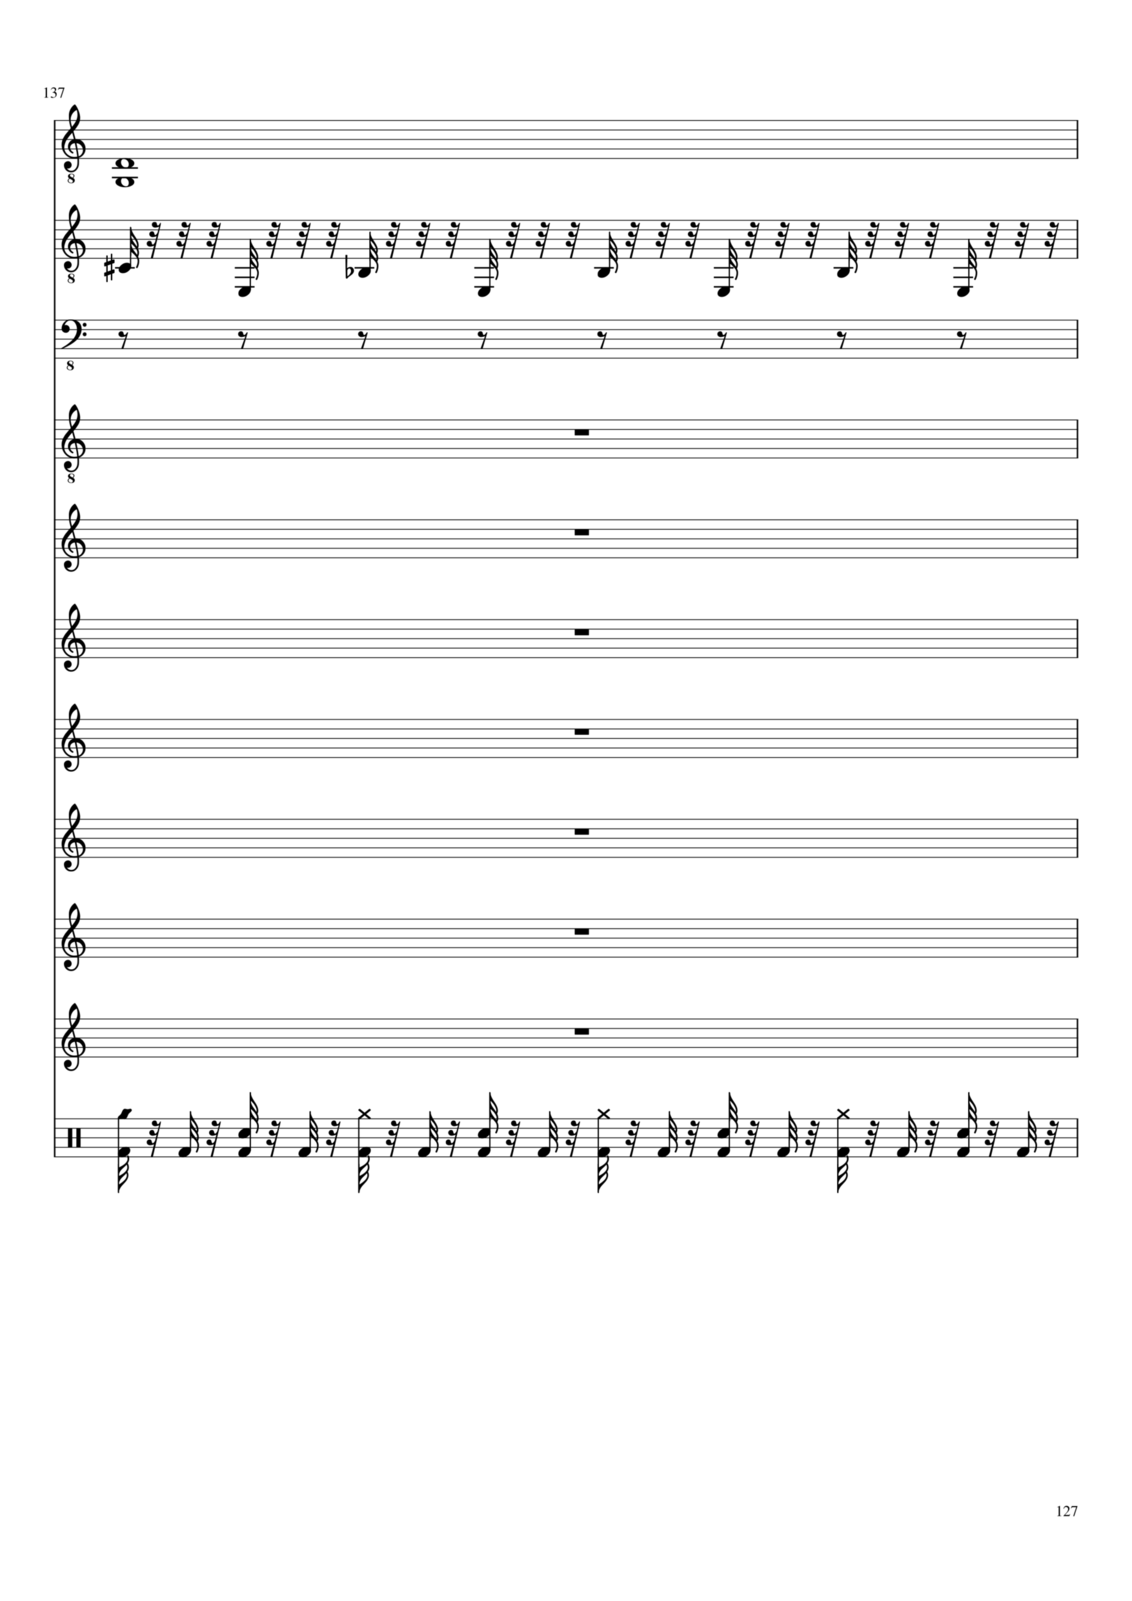 Belyiy sokol slide, Image 127